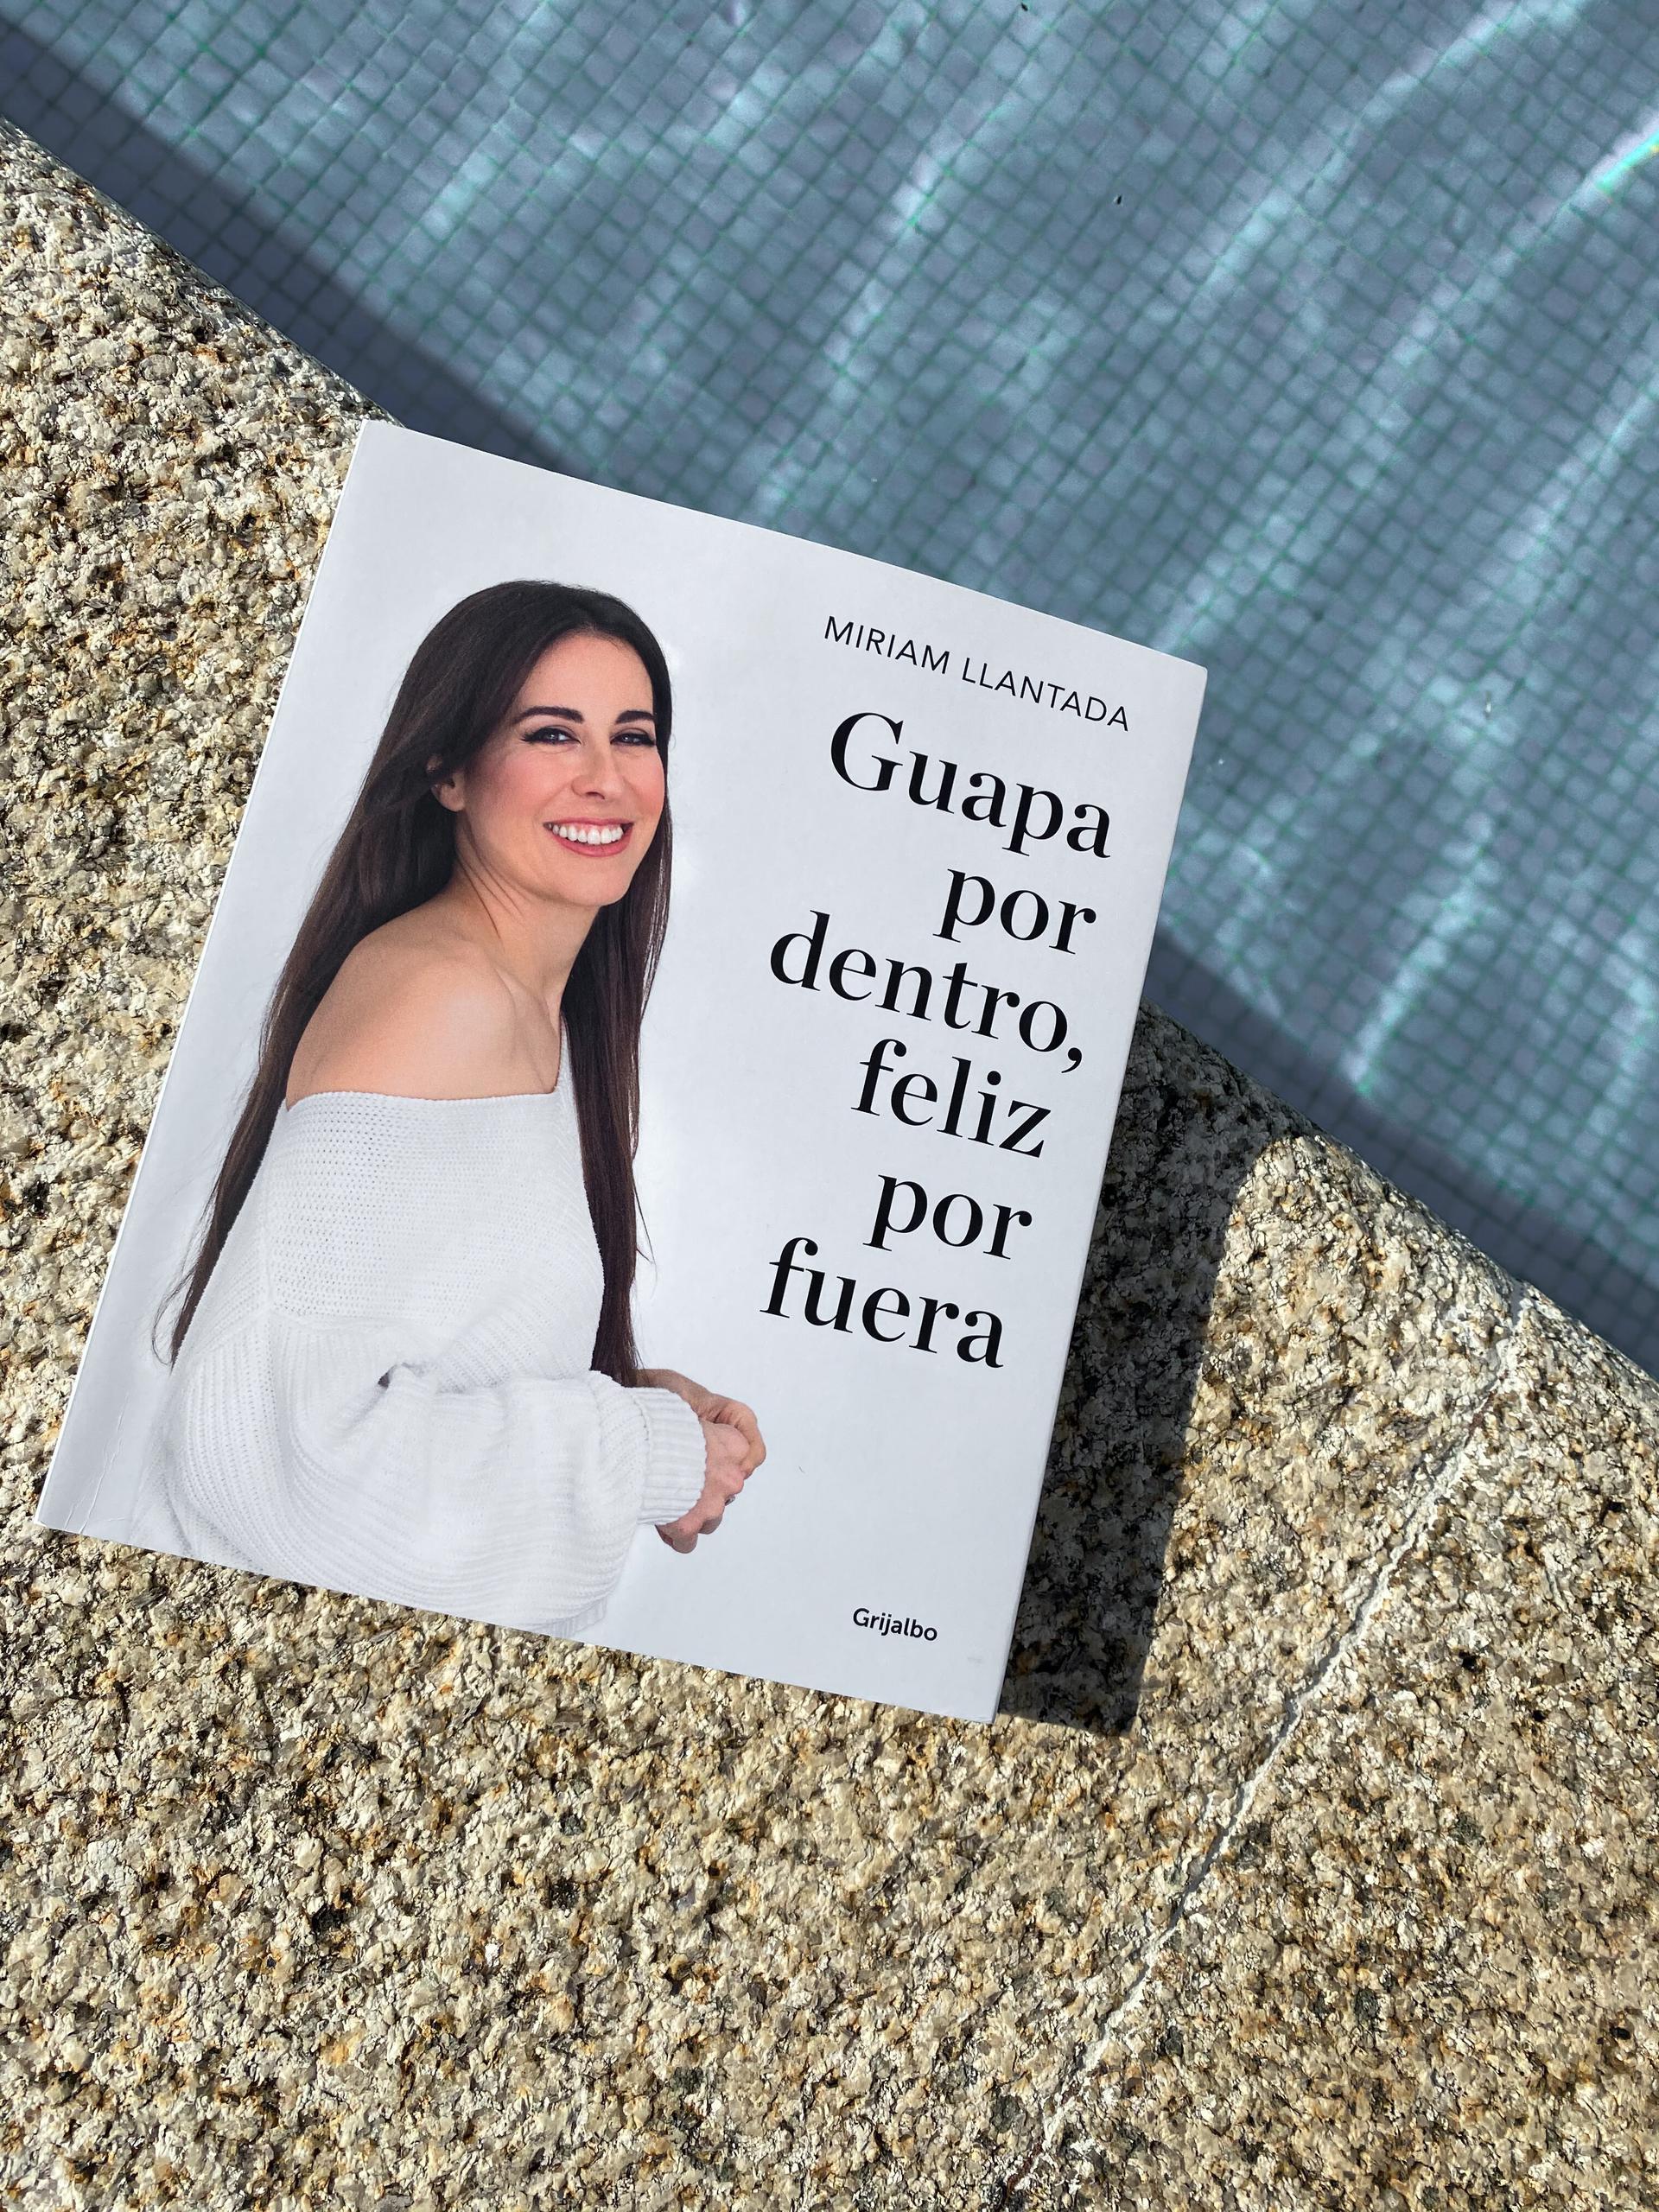 Miriam Llantada/ canariasnoticias